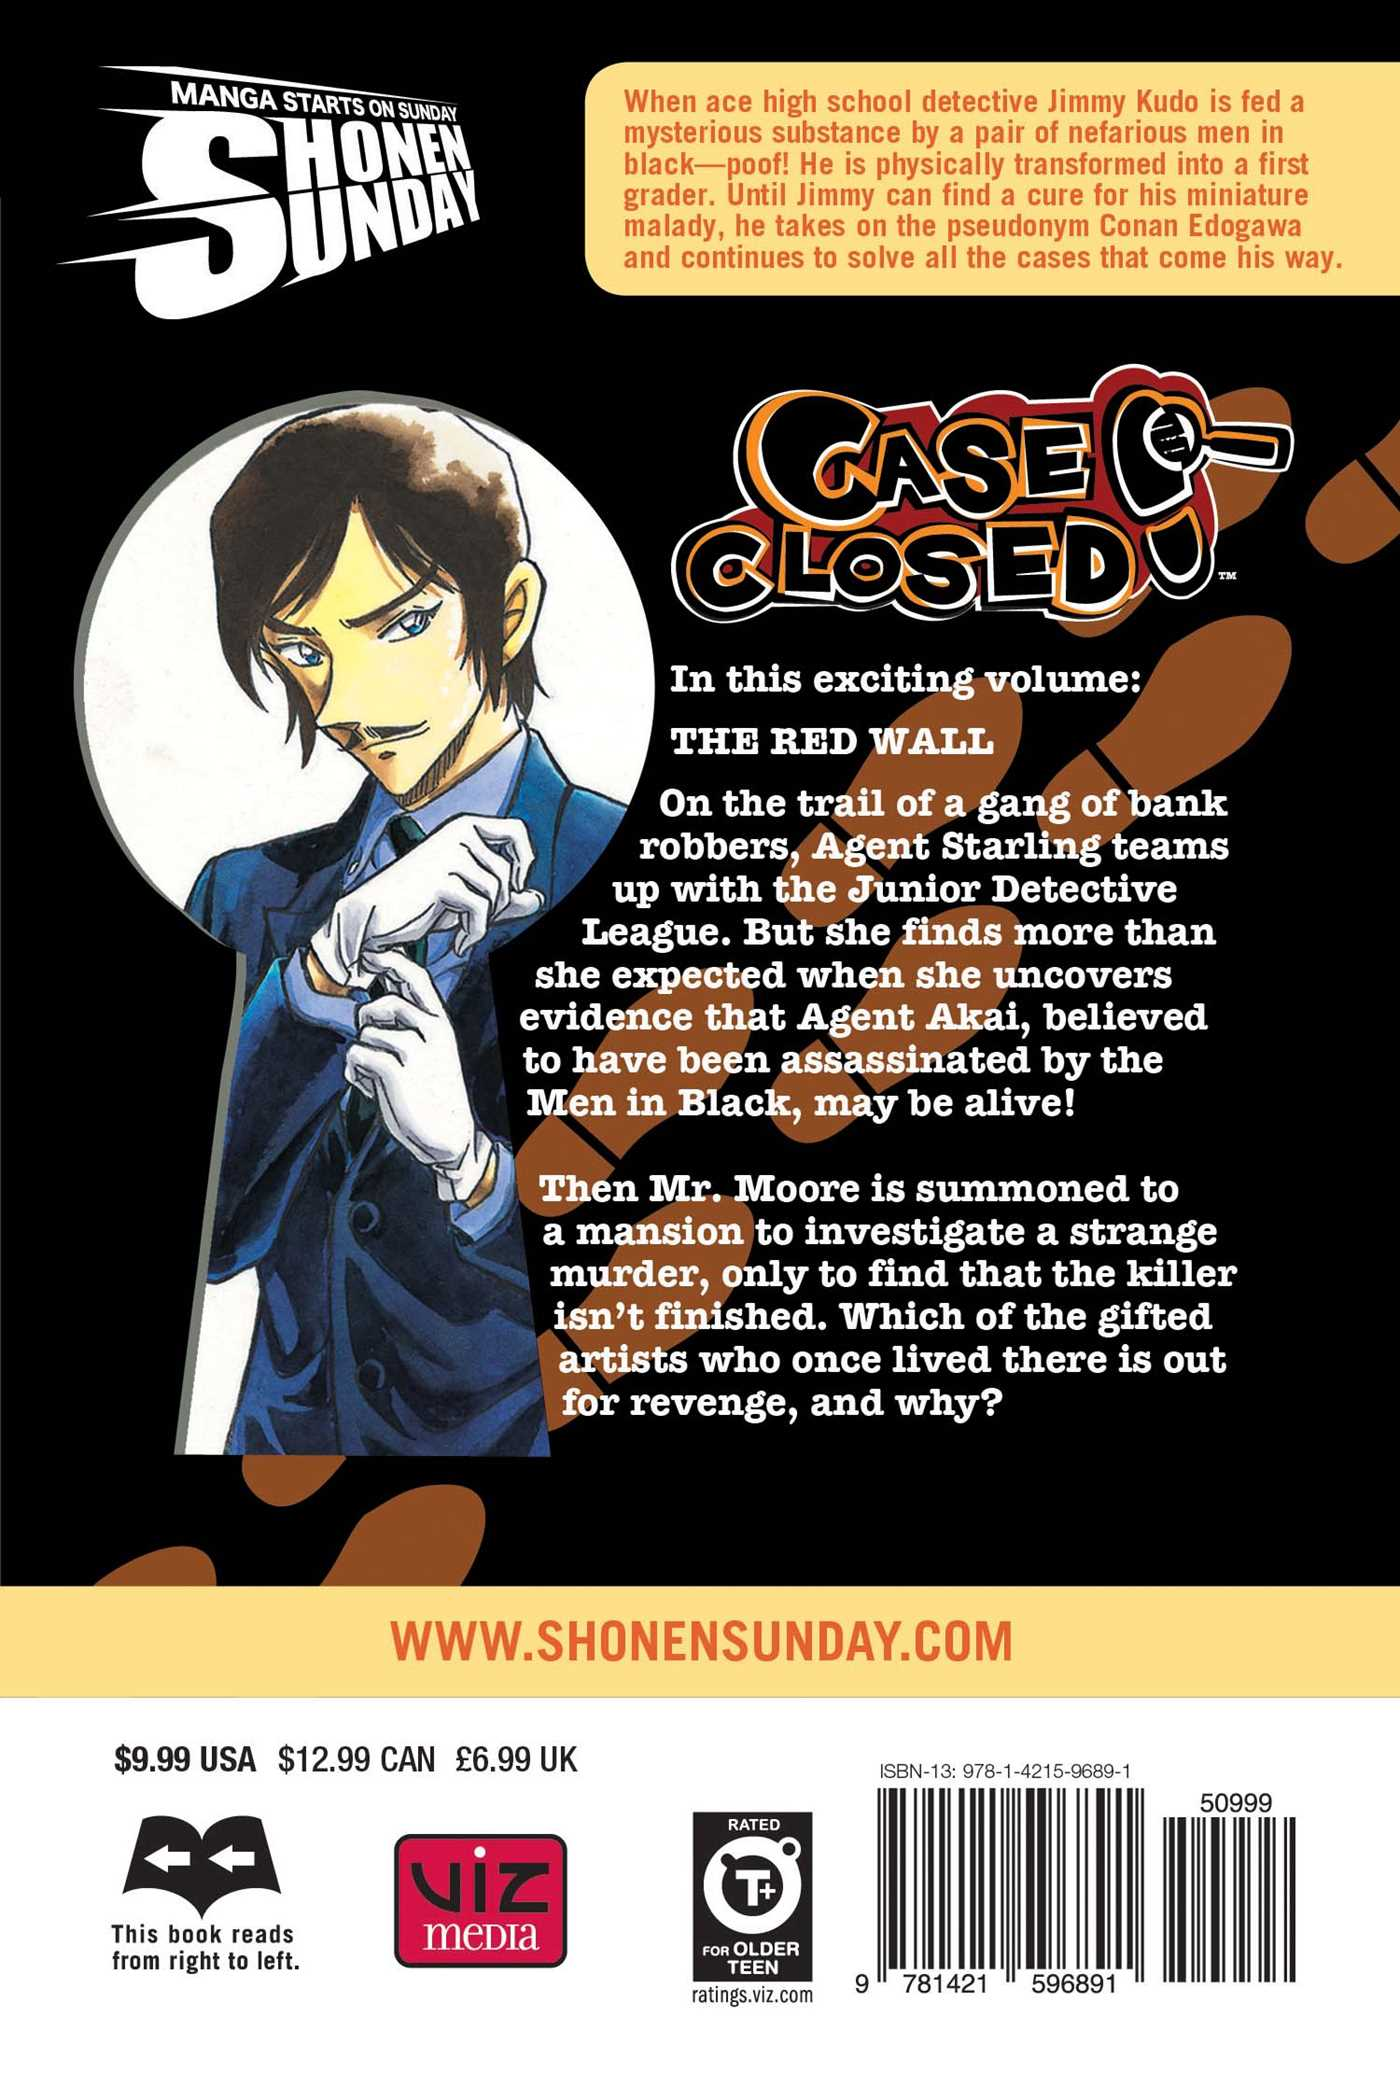 Case closed vol 65 9781421596891 hr back